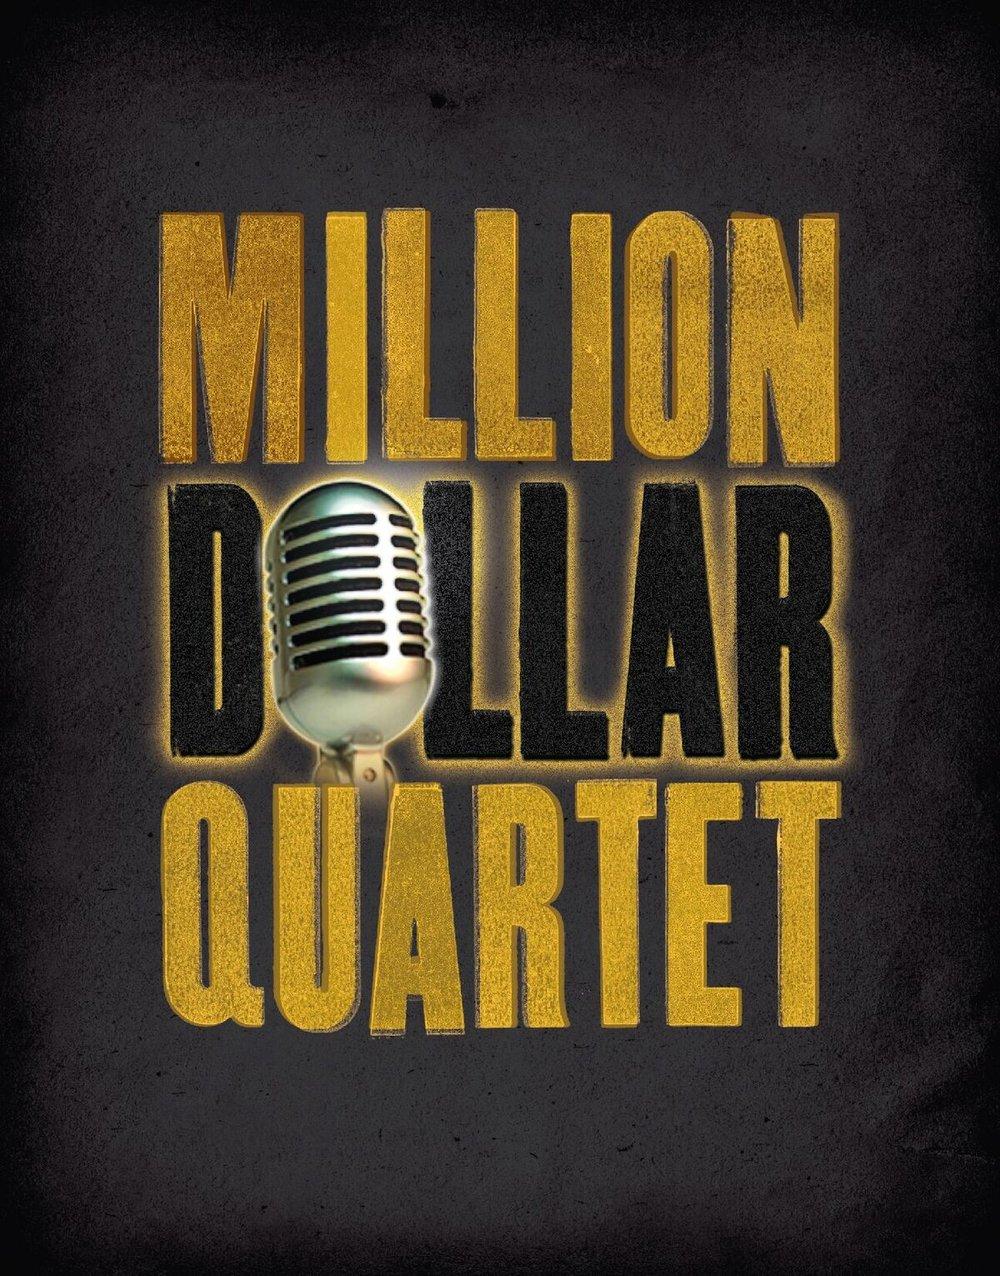 MILLION DOLLAR QUARTET - ART.jpg